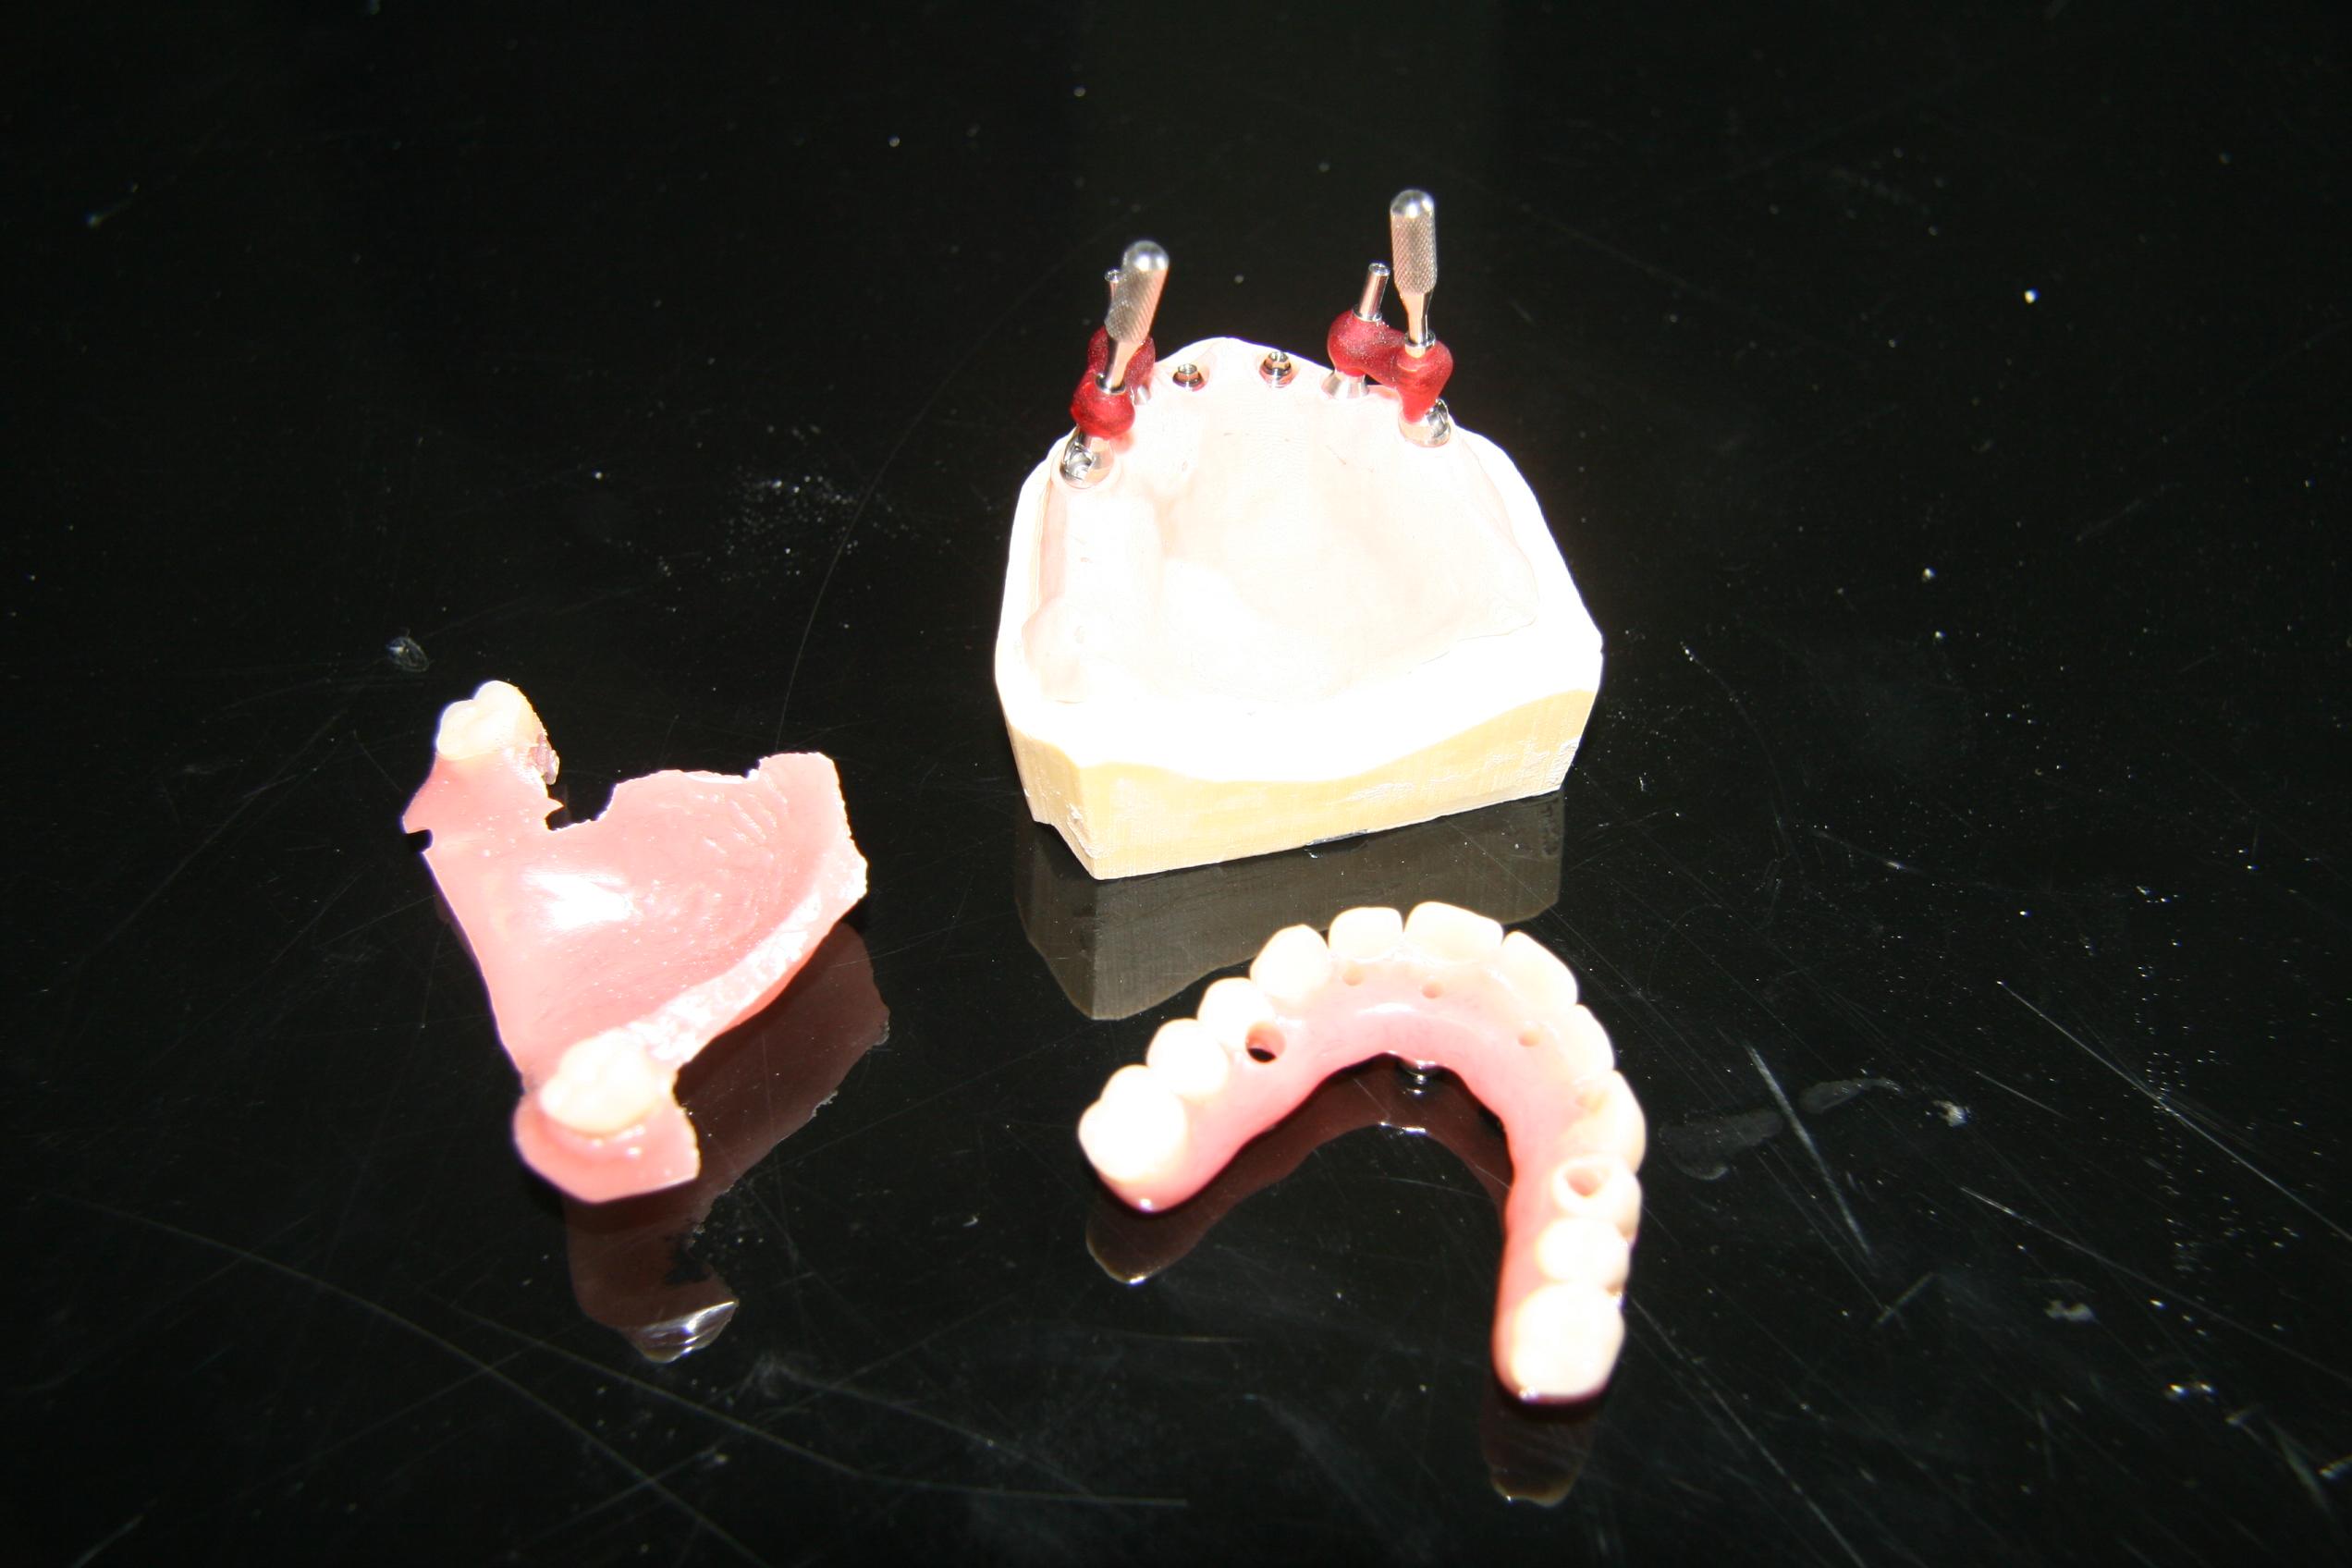 préparation prothèse